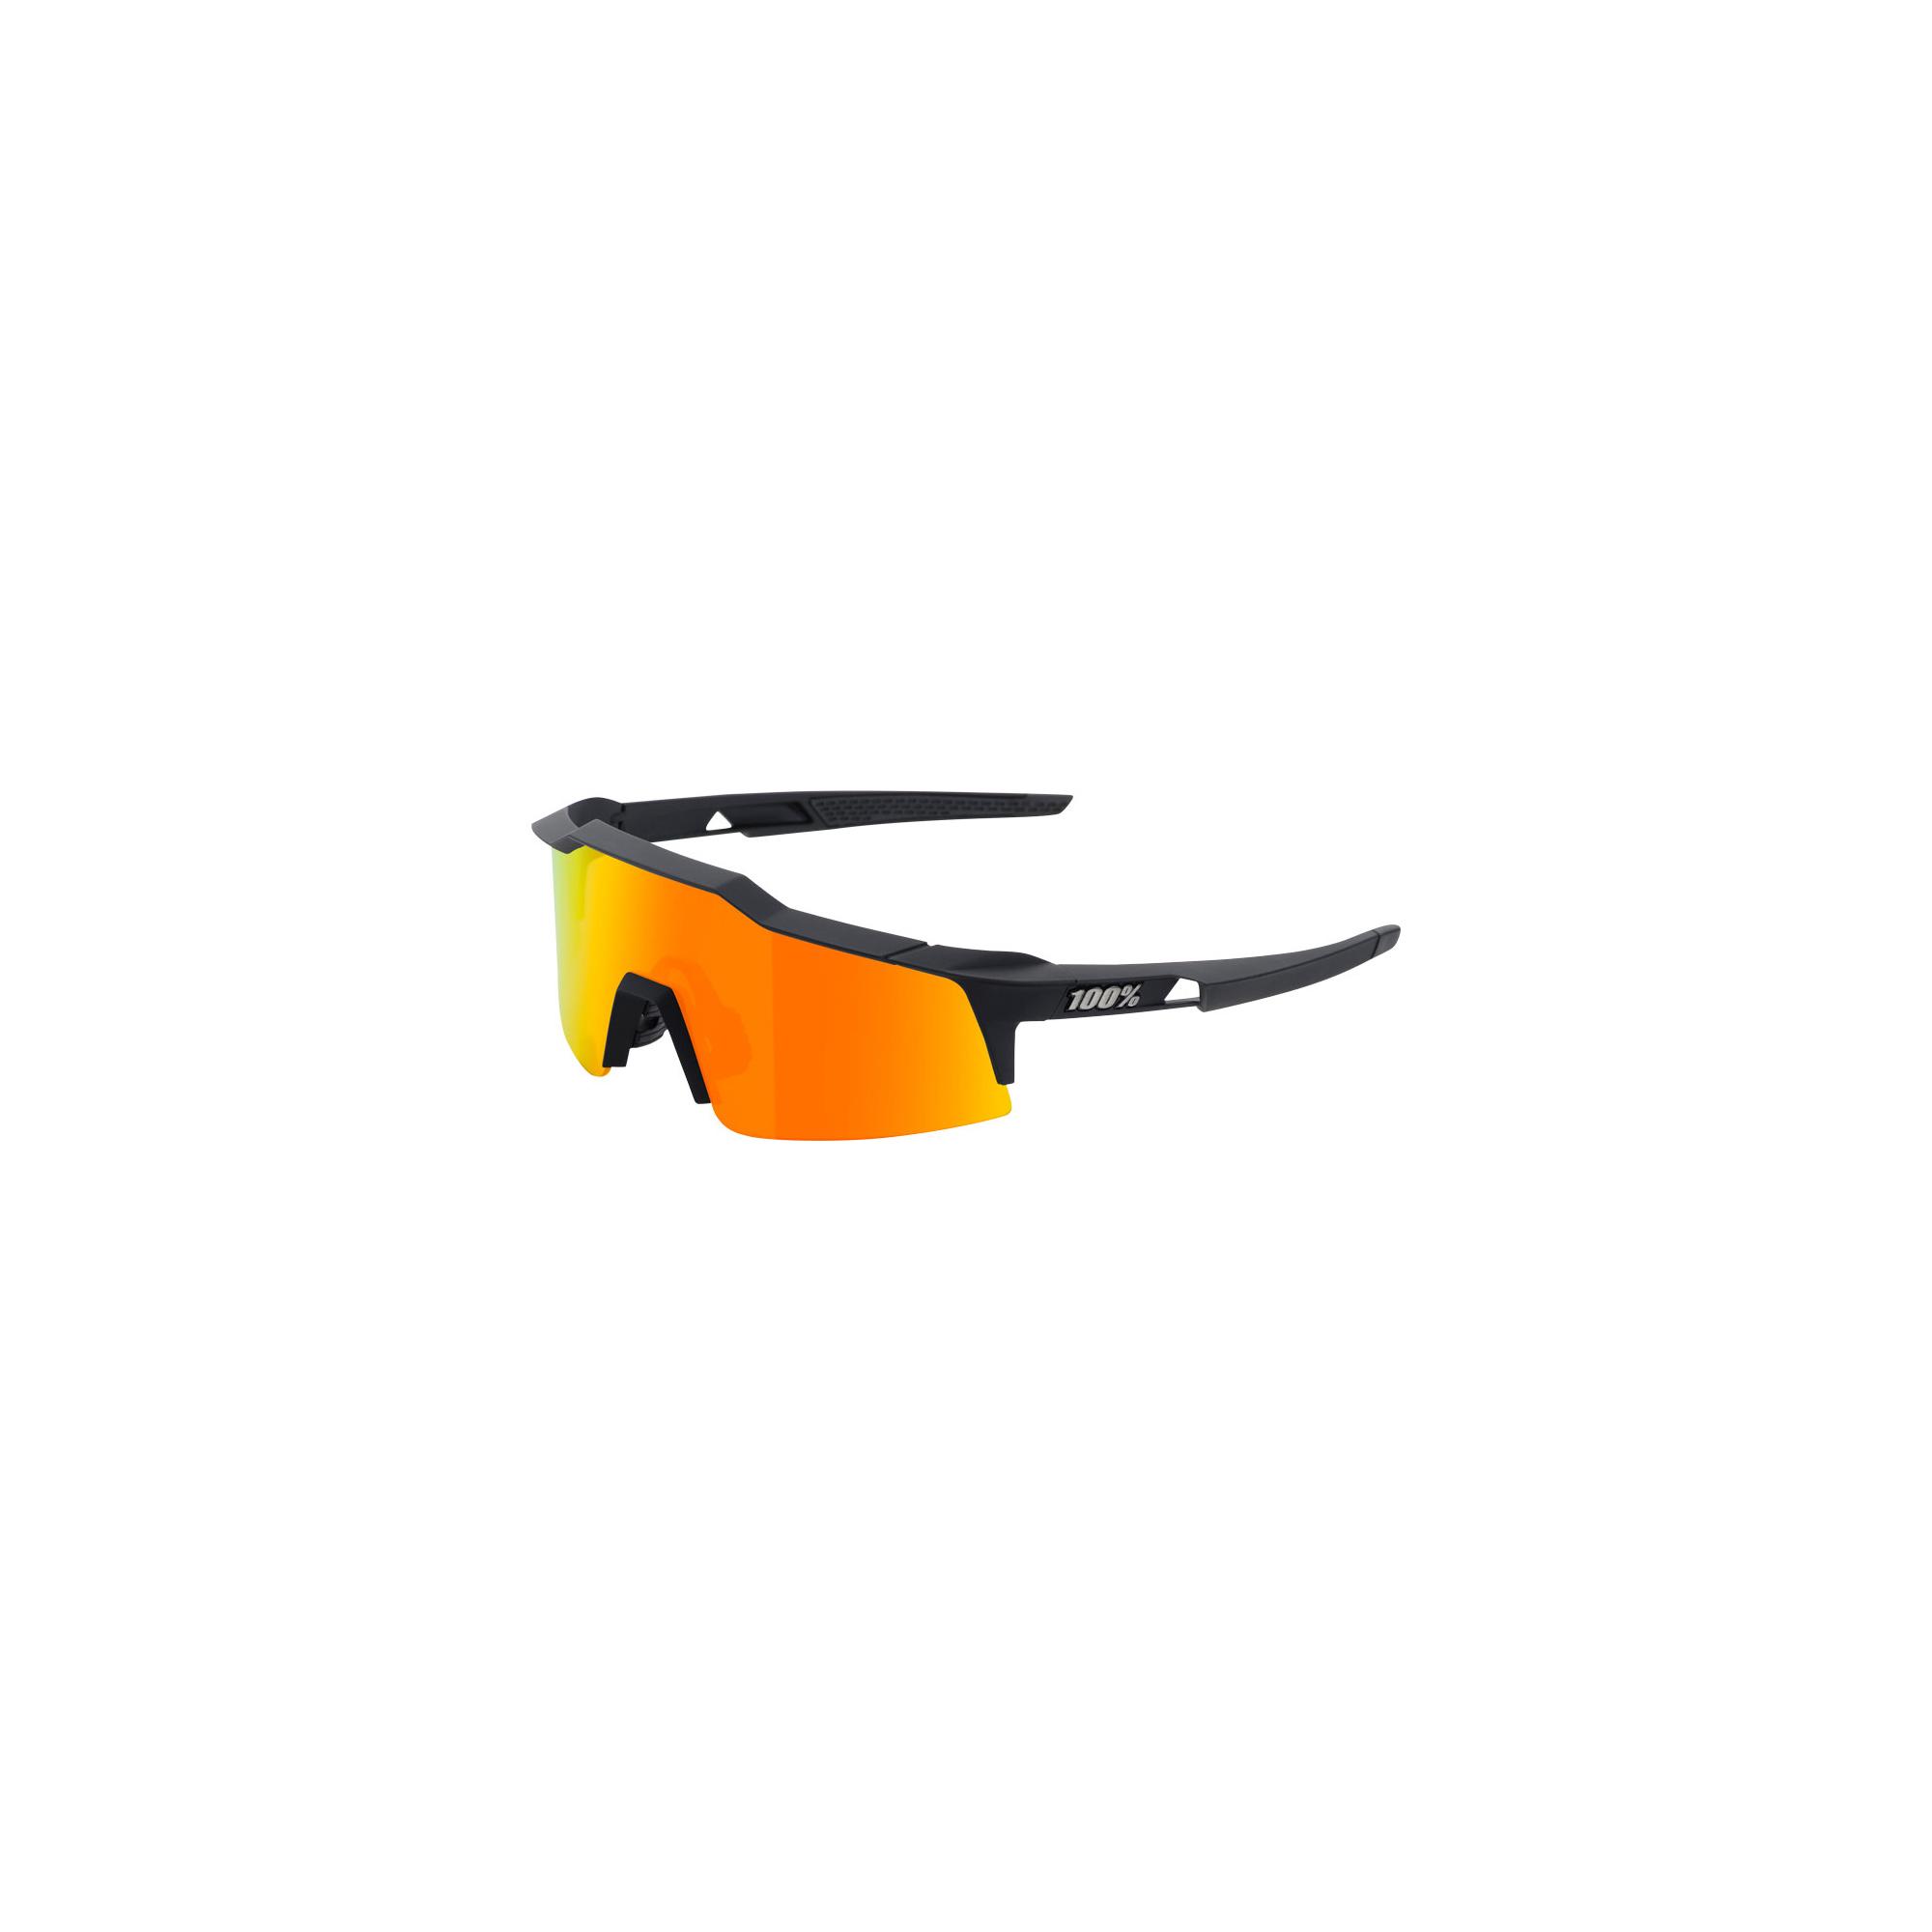 1da0c07375 Details about 100% Speedcraft SL Sunglasses Black HiPER Red Multilayer  Mirror Lens